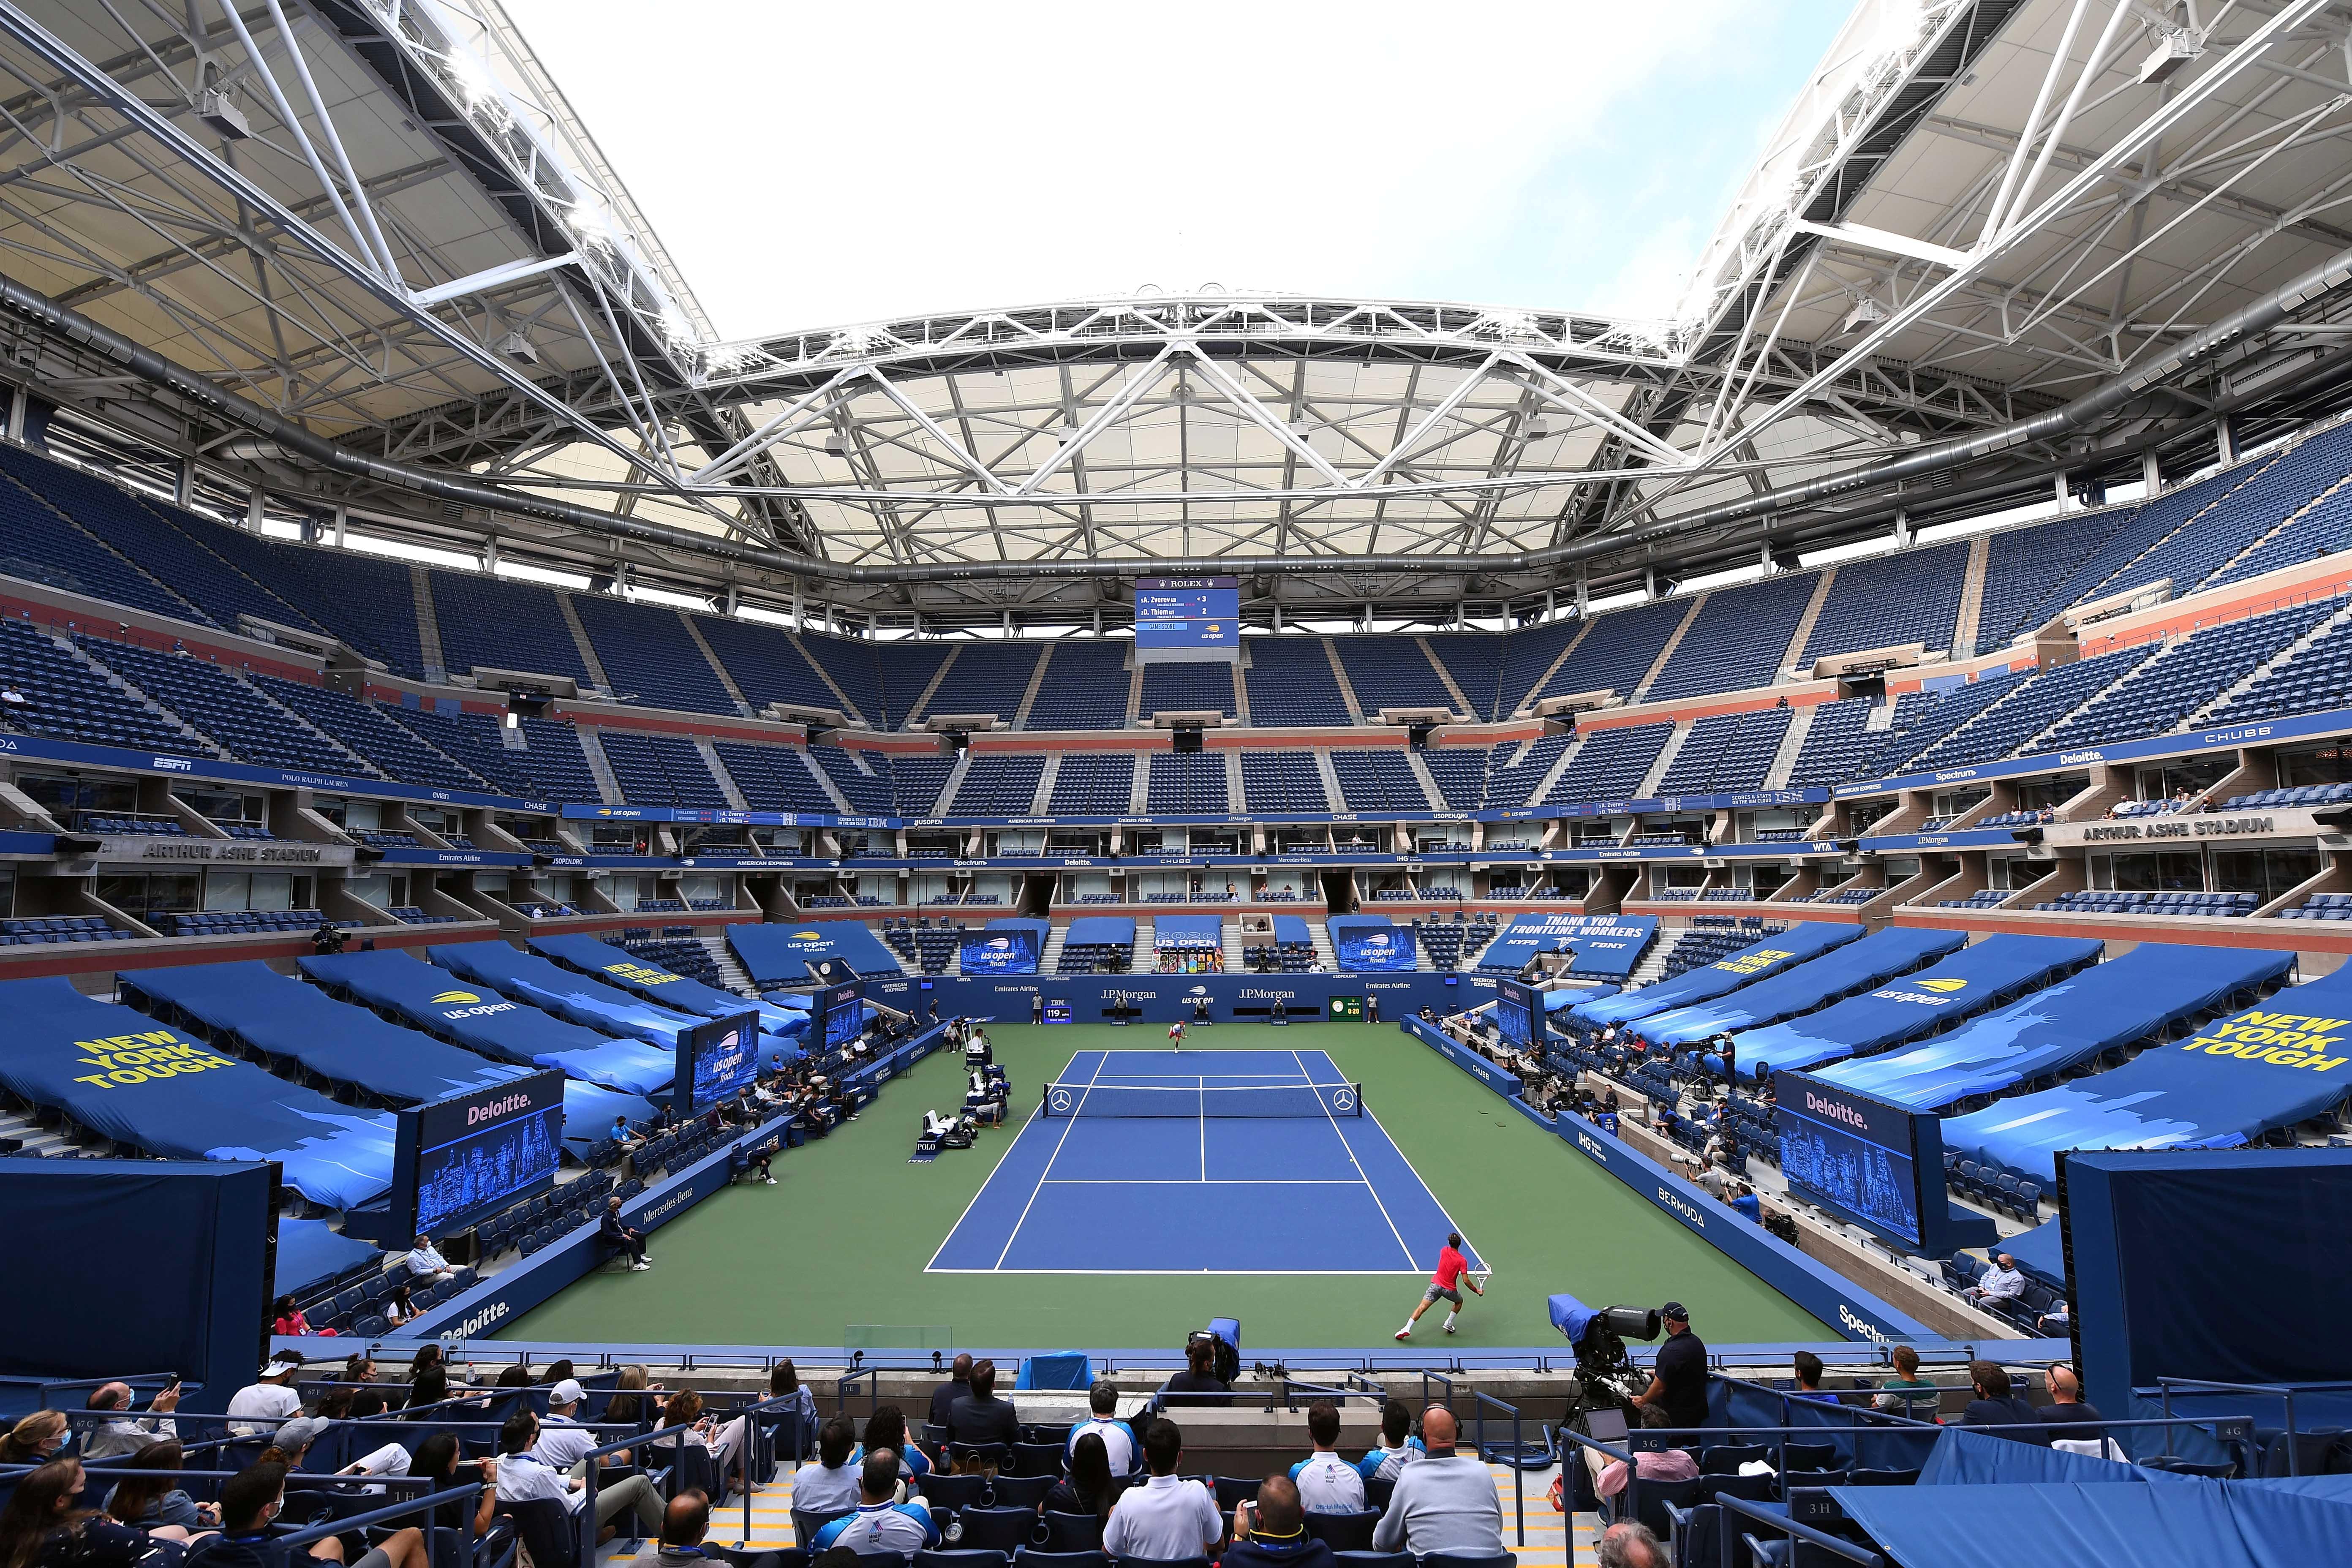 Sep 13, 2020; Flushing Meadows, New York, USA; General view of Arthur Ashe Stadium at USTA Billie Jean King National Tennis Center. Mandatory Credit: Robert Deutsch-USA TODAY Sports/File photo